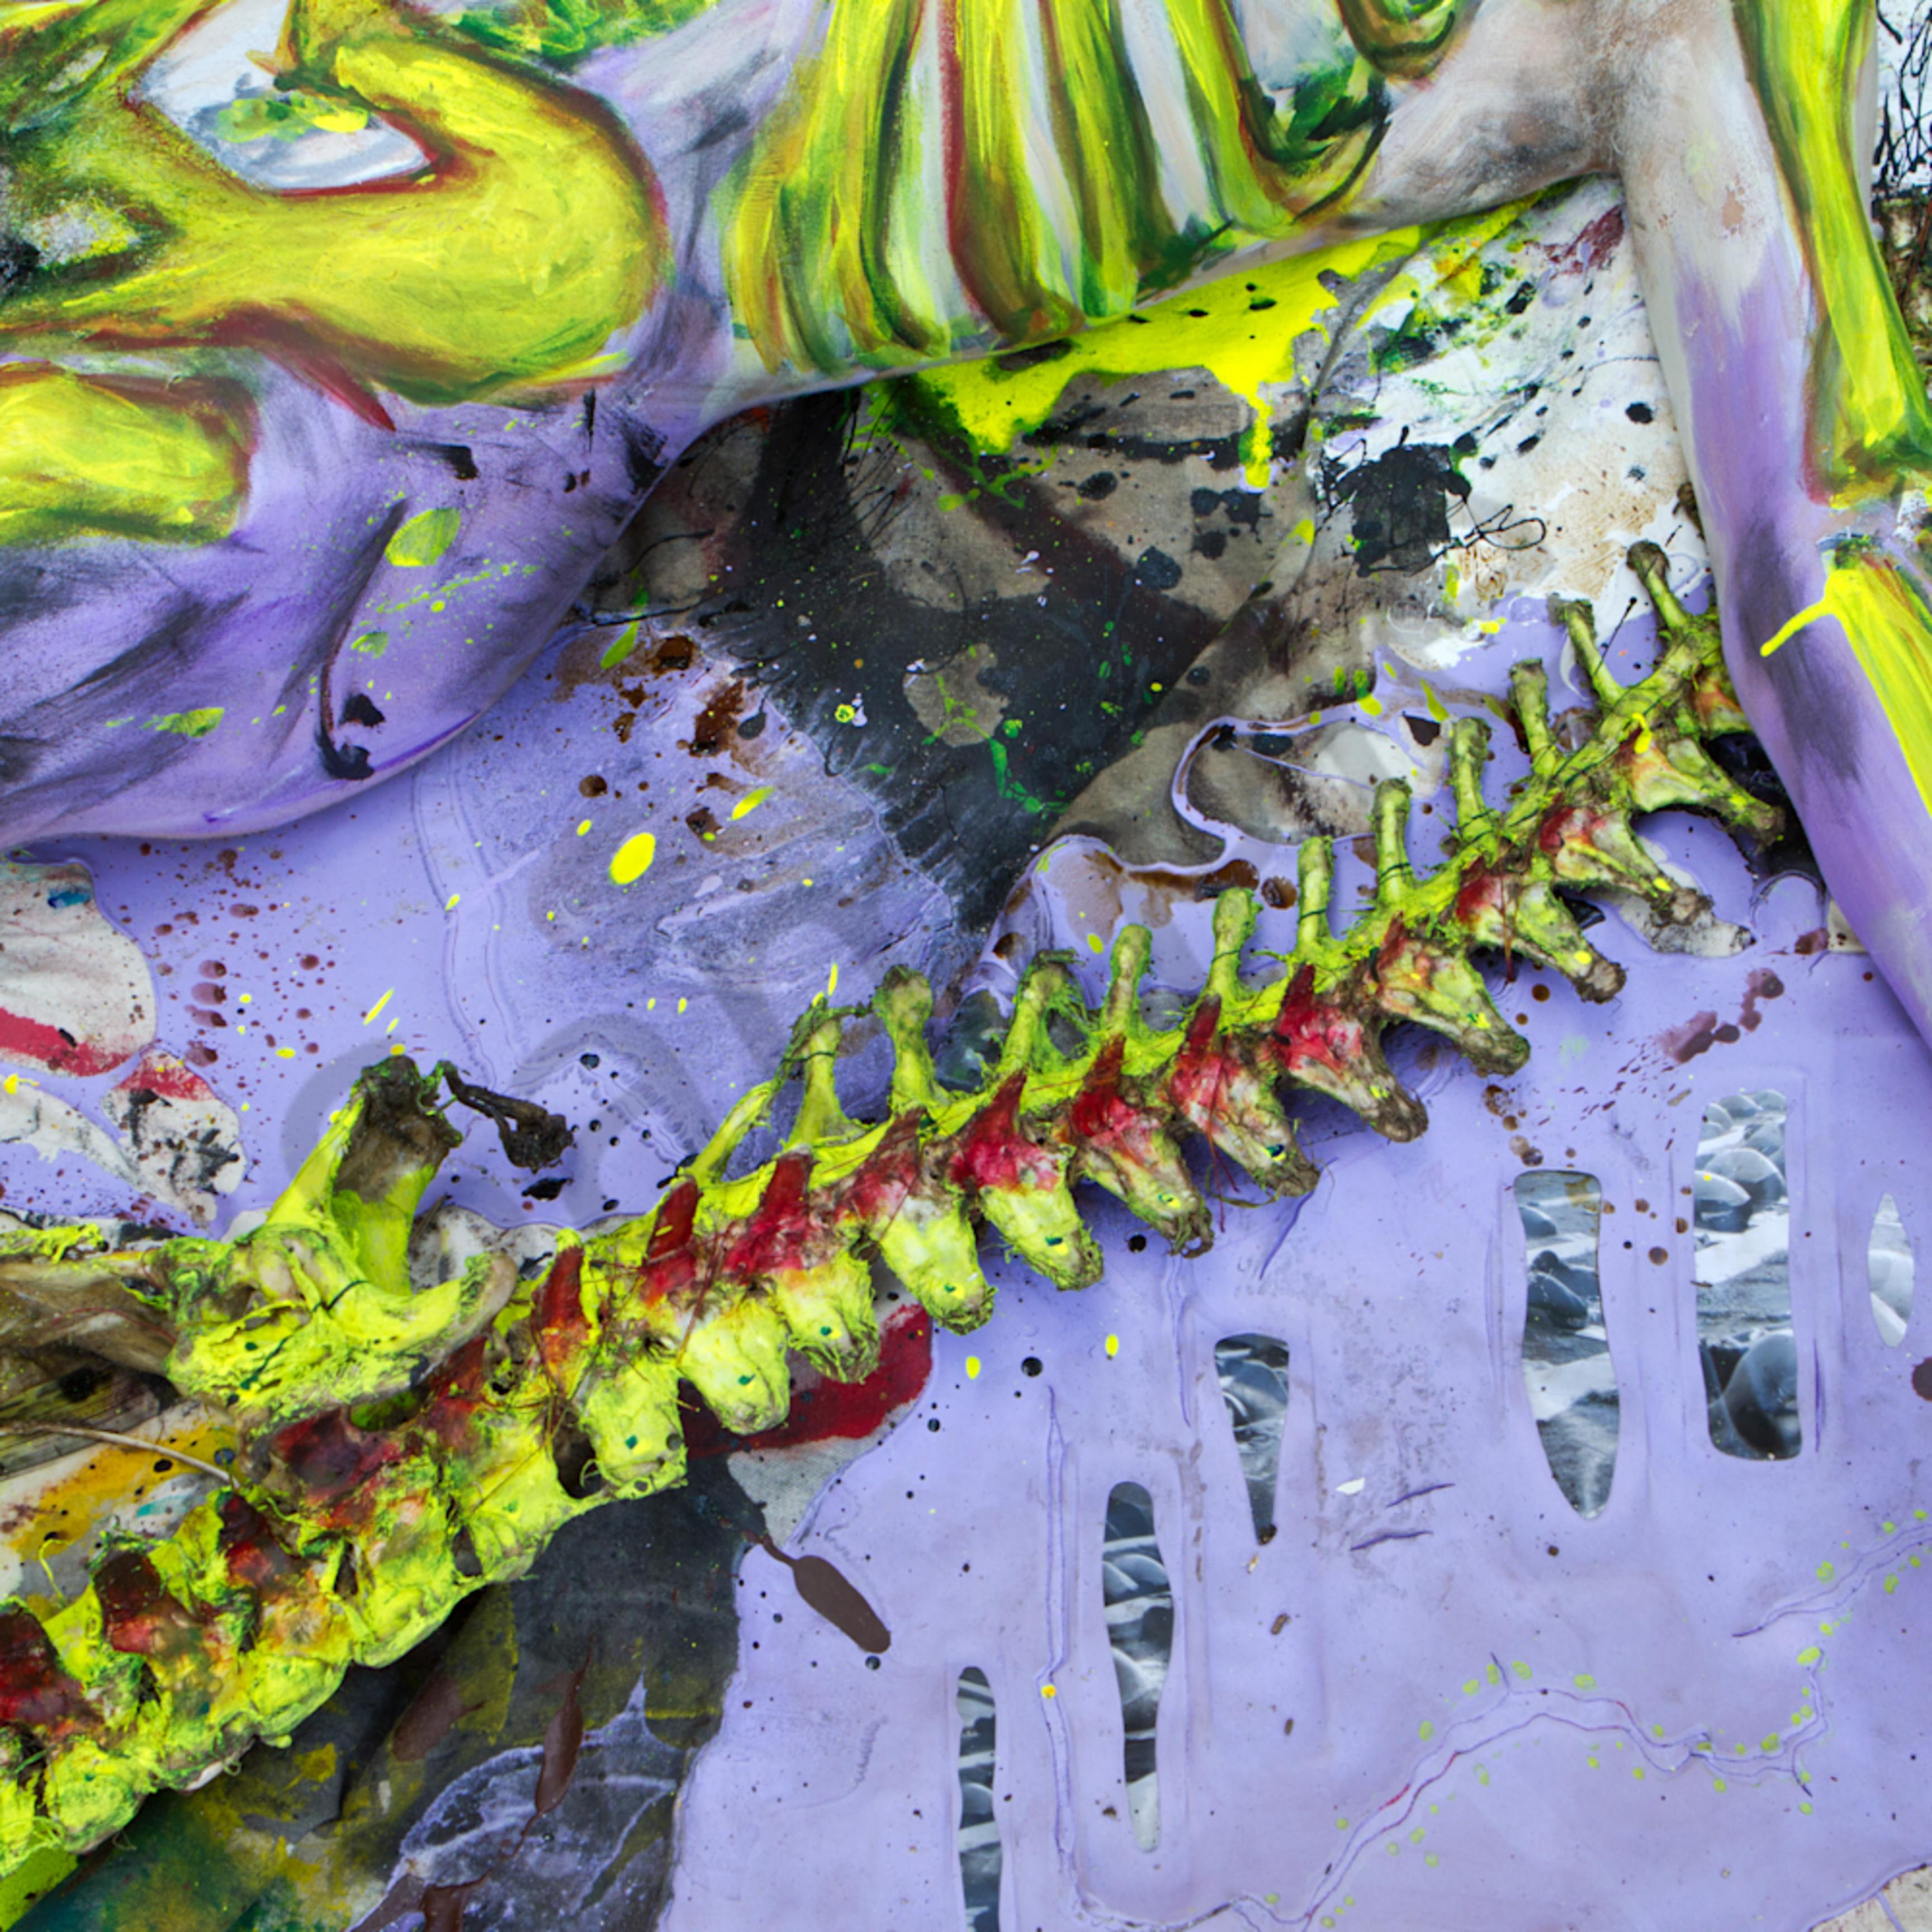 2013 alligatorcarcasspainting florida wmoxxa